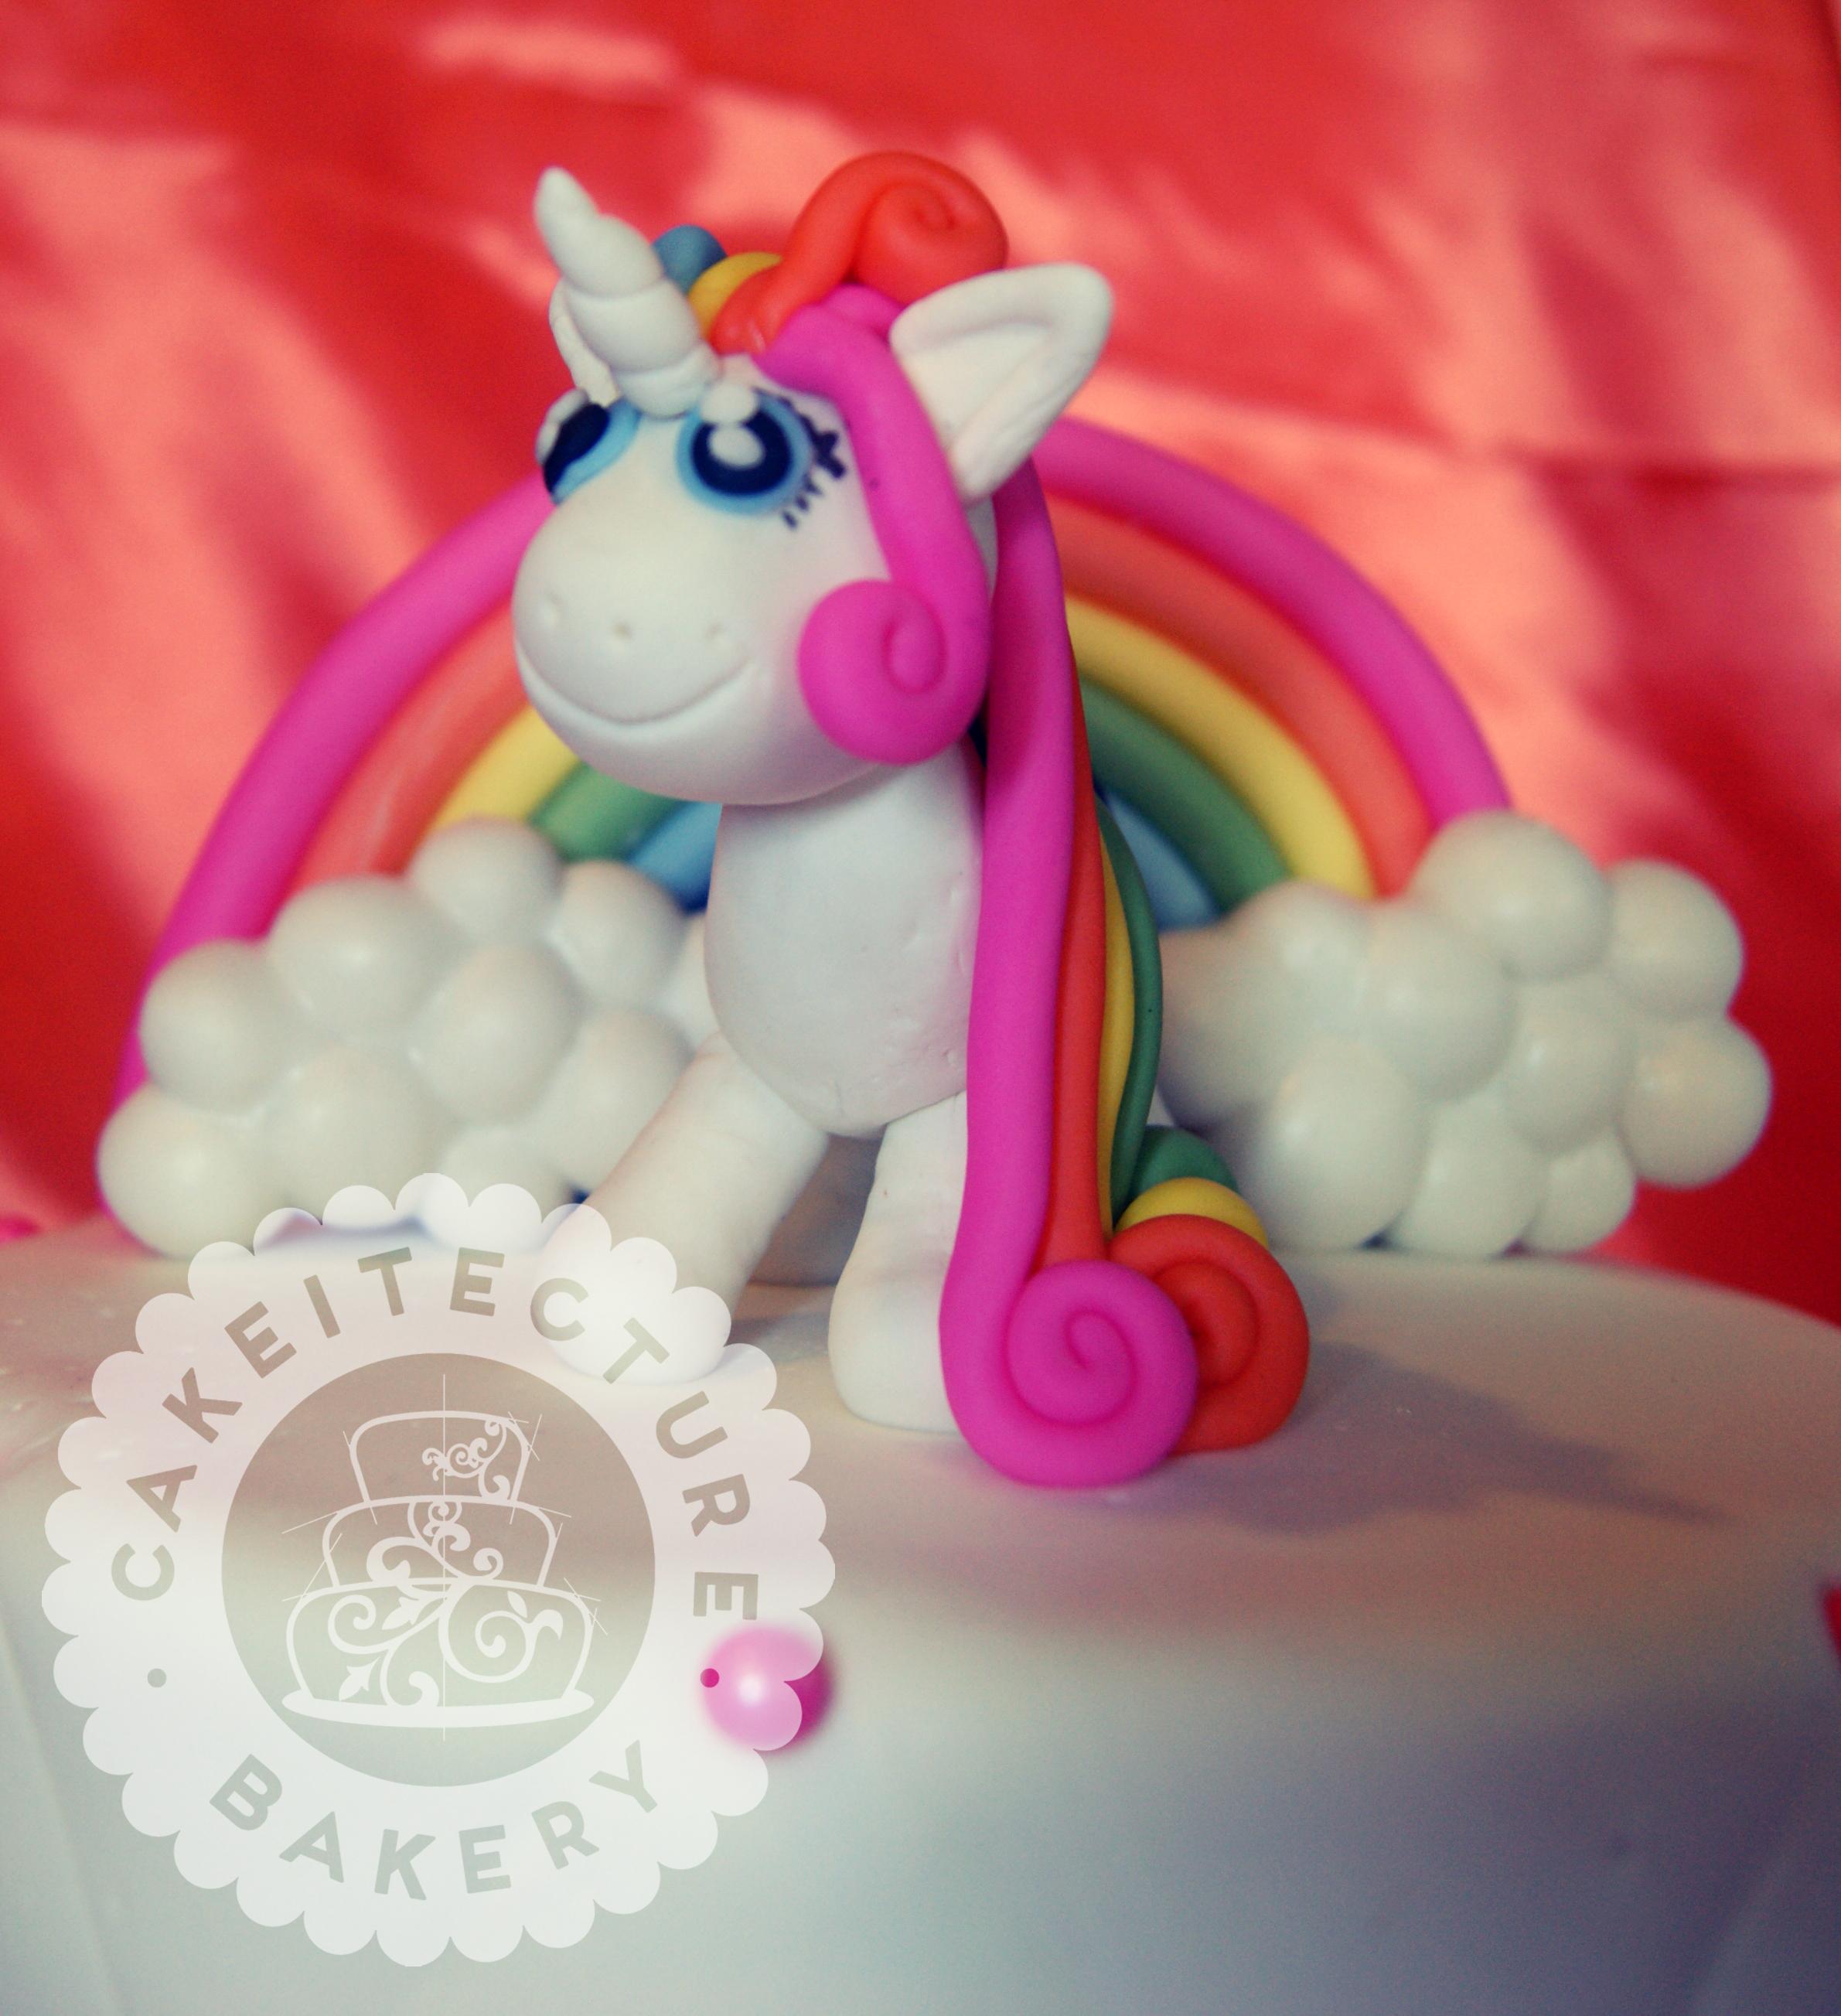 Rainbow-Unicorn 2.jpg